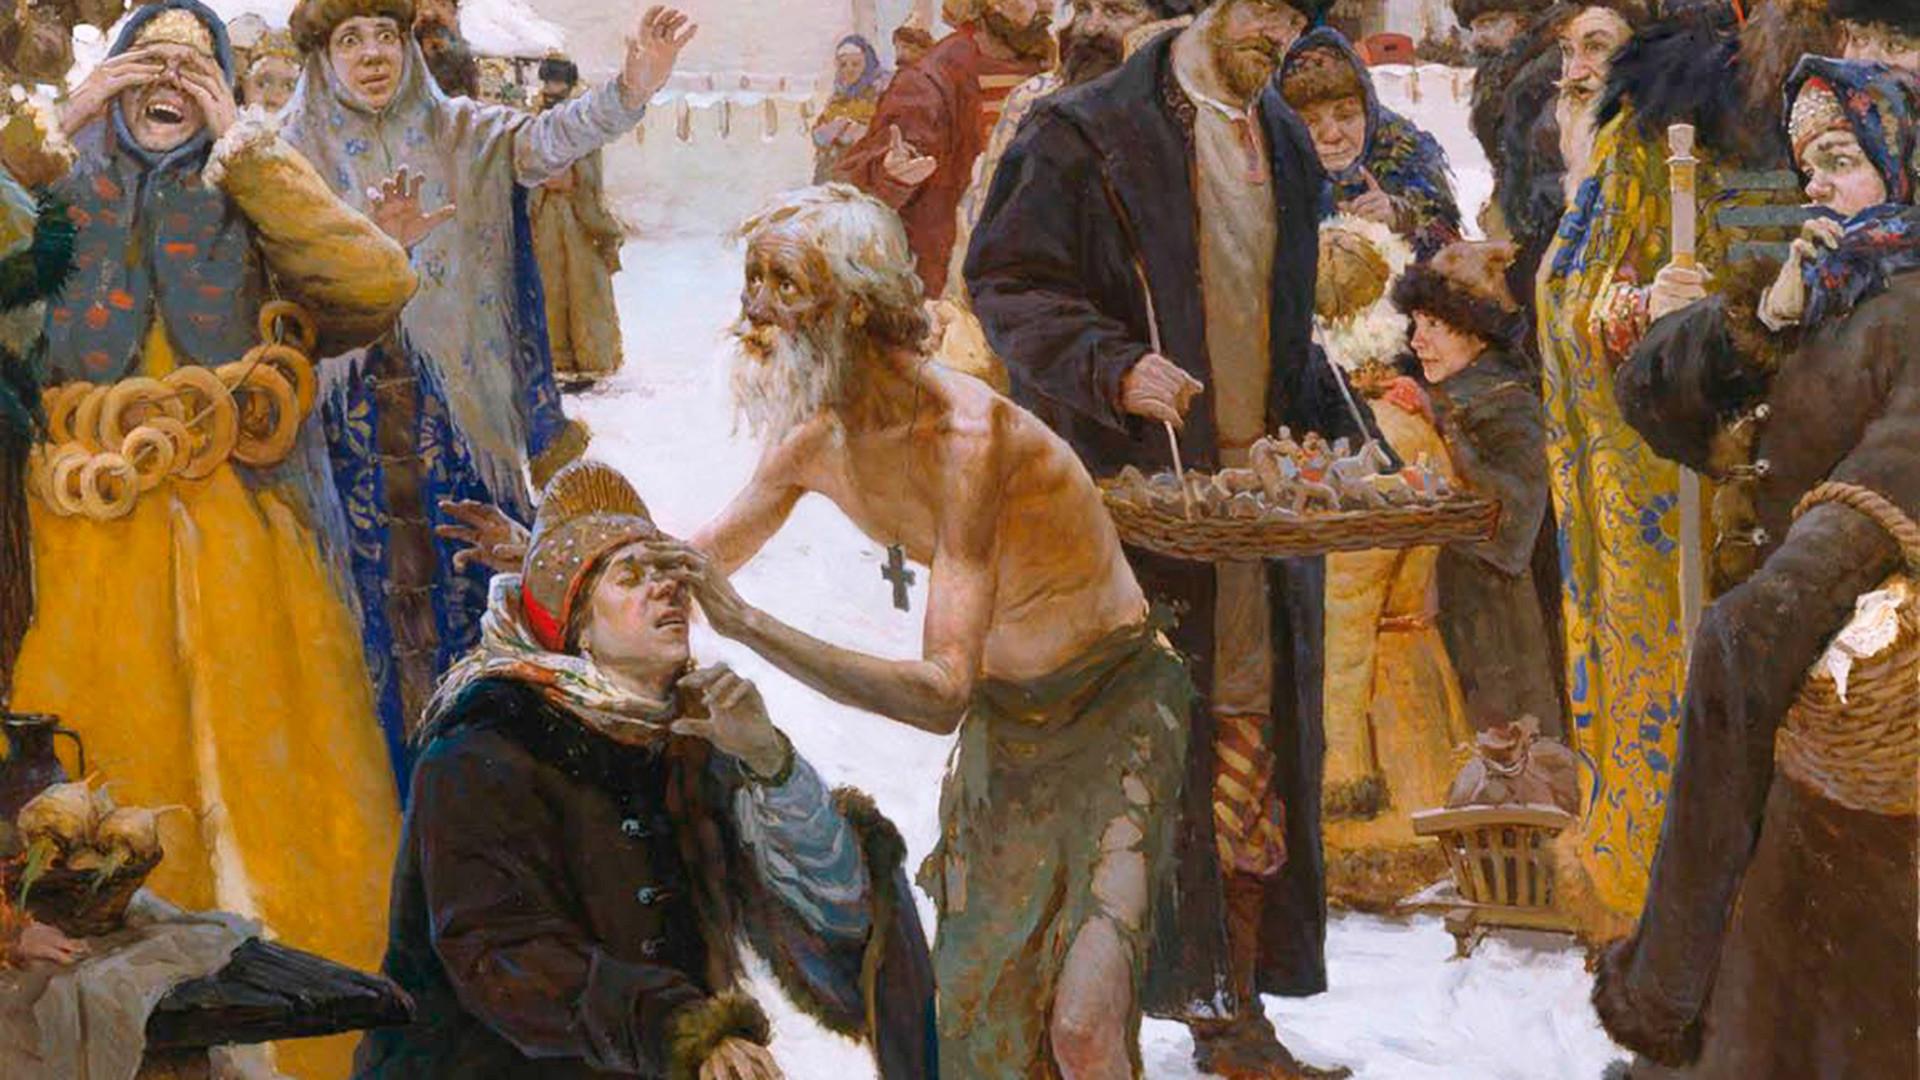 Le fol-en-Christ moscovite Saint Basile (Vassili)